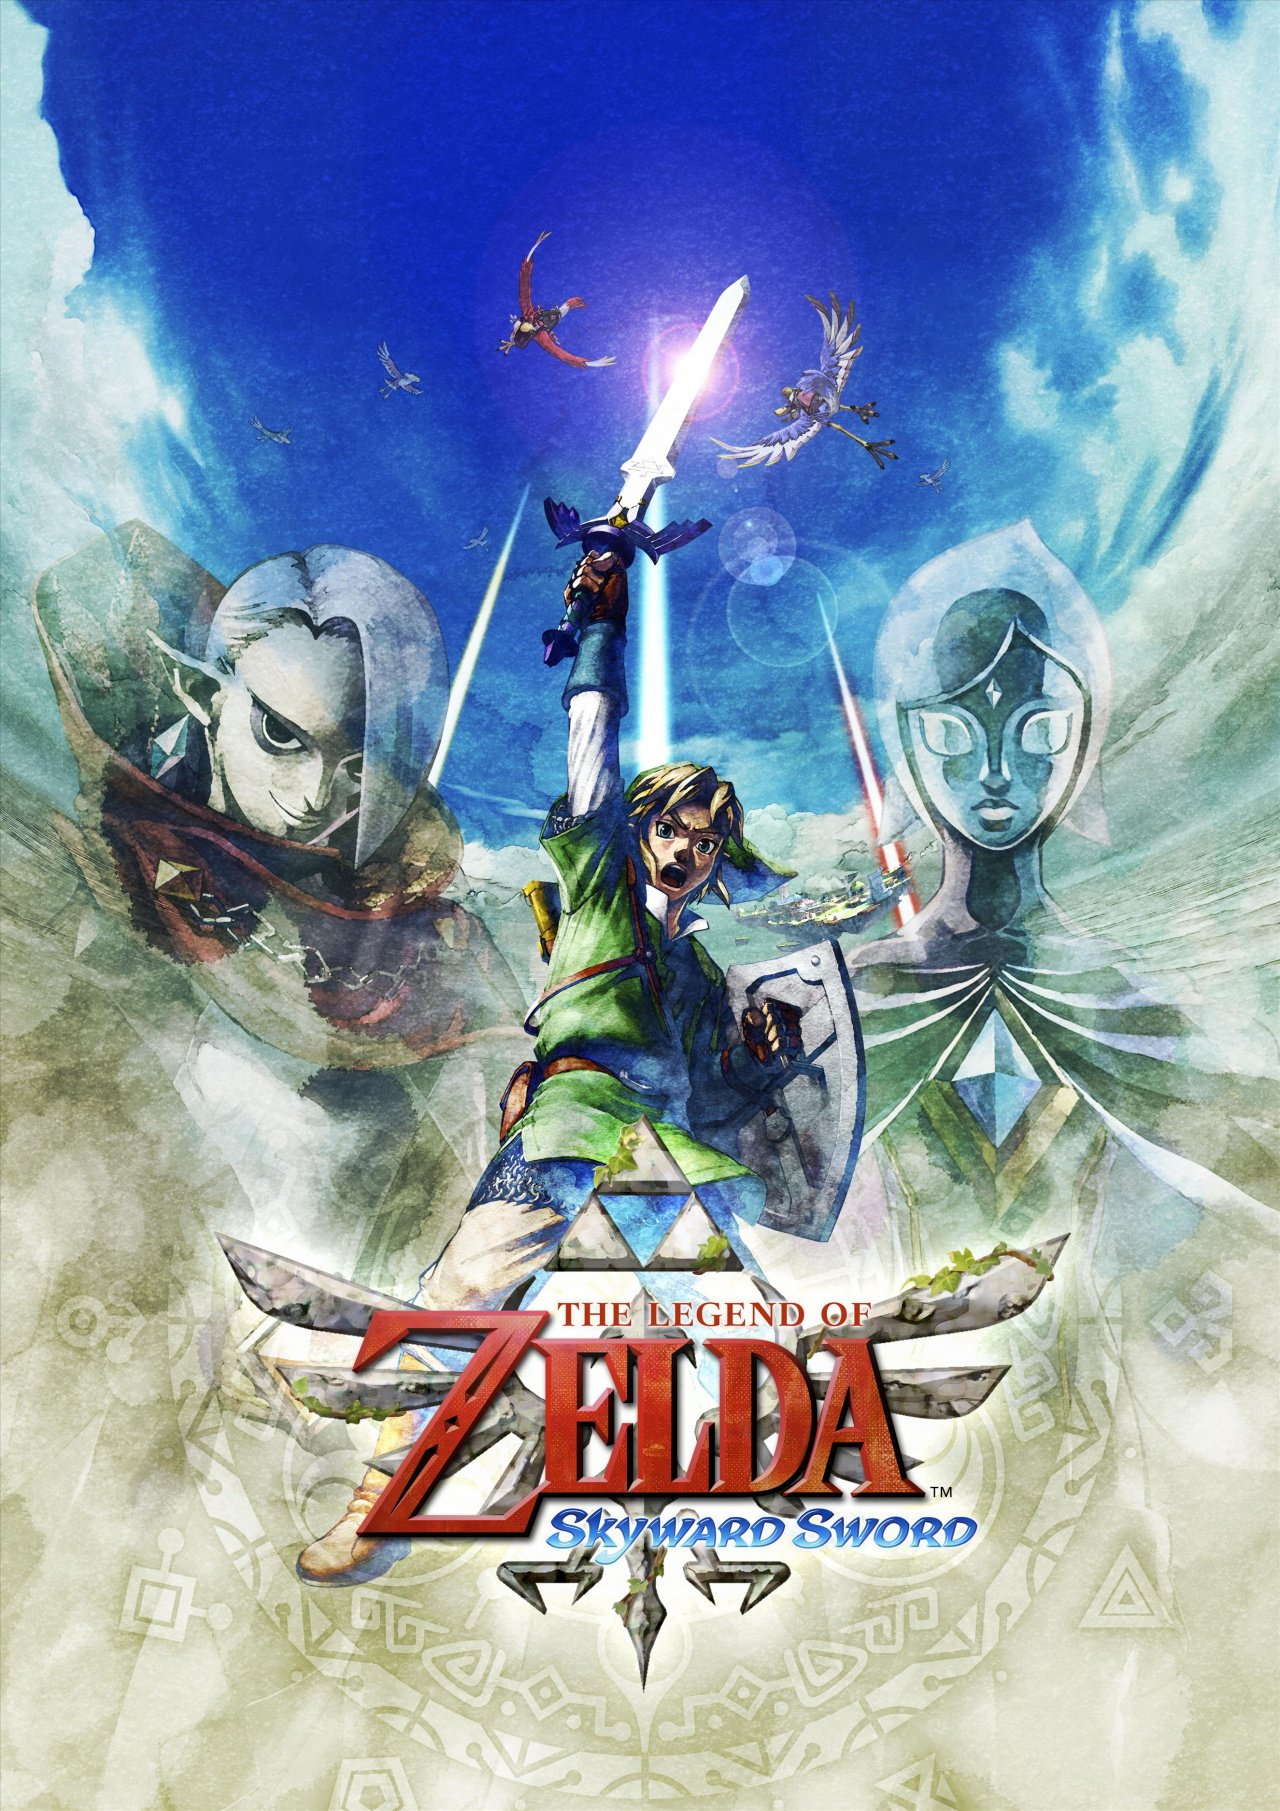 The Legend of Zelda (video game) - Wikipedia